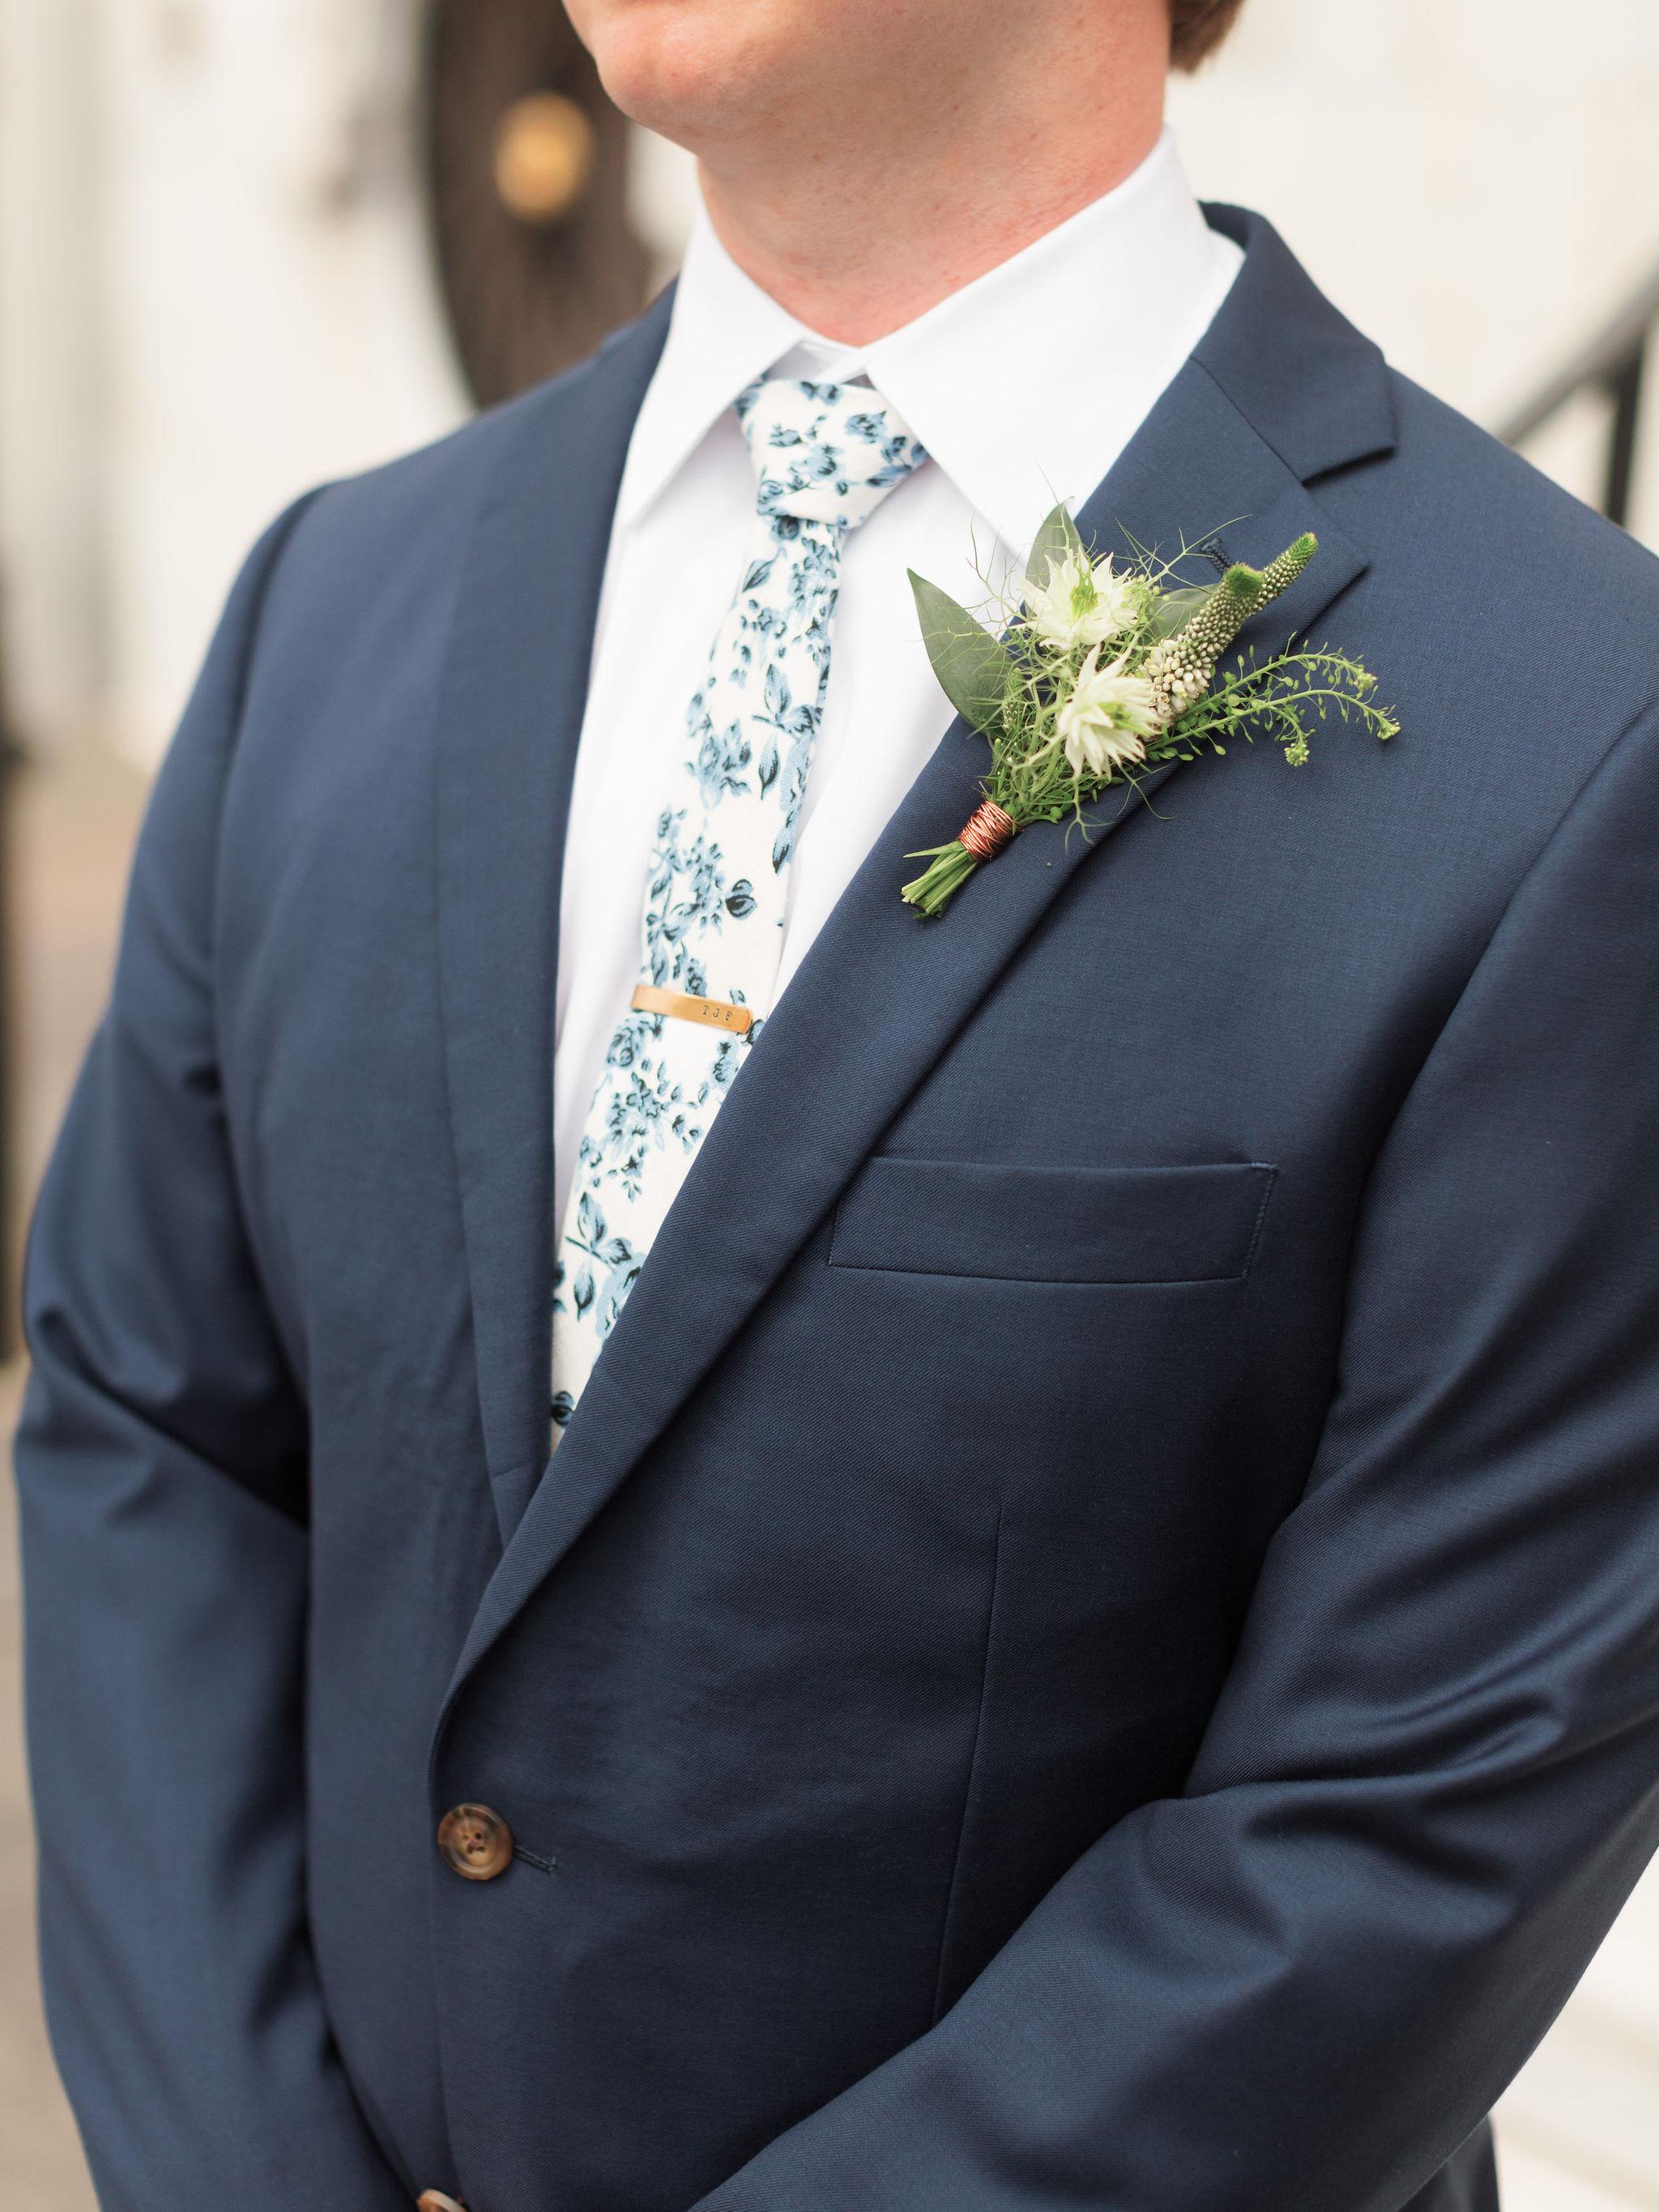 charleston-wedding-merchants-hall